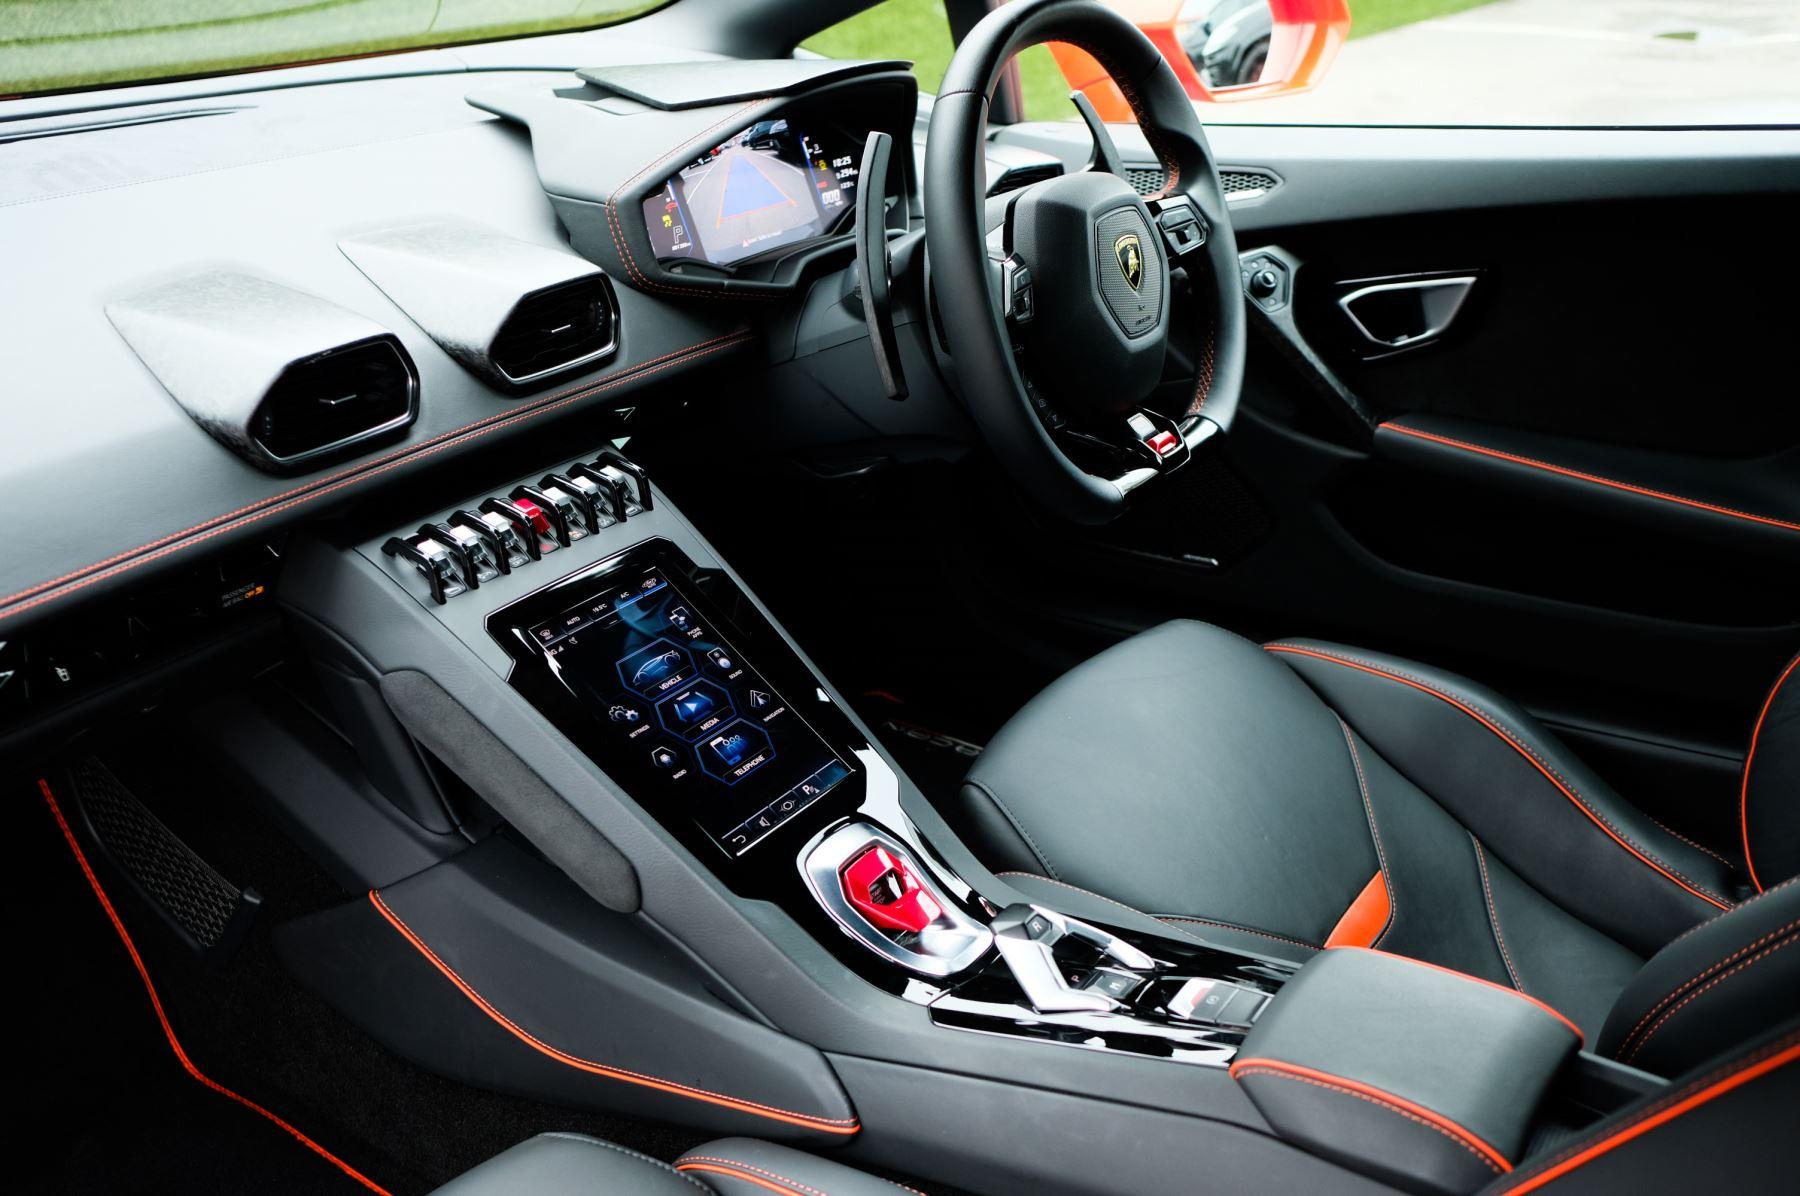 Lamborghini Huracan EVO LP 640-4 LDF image 7